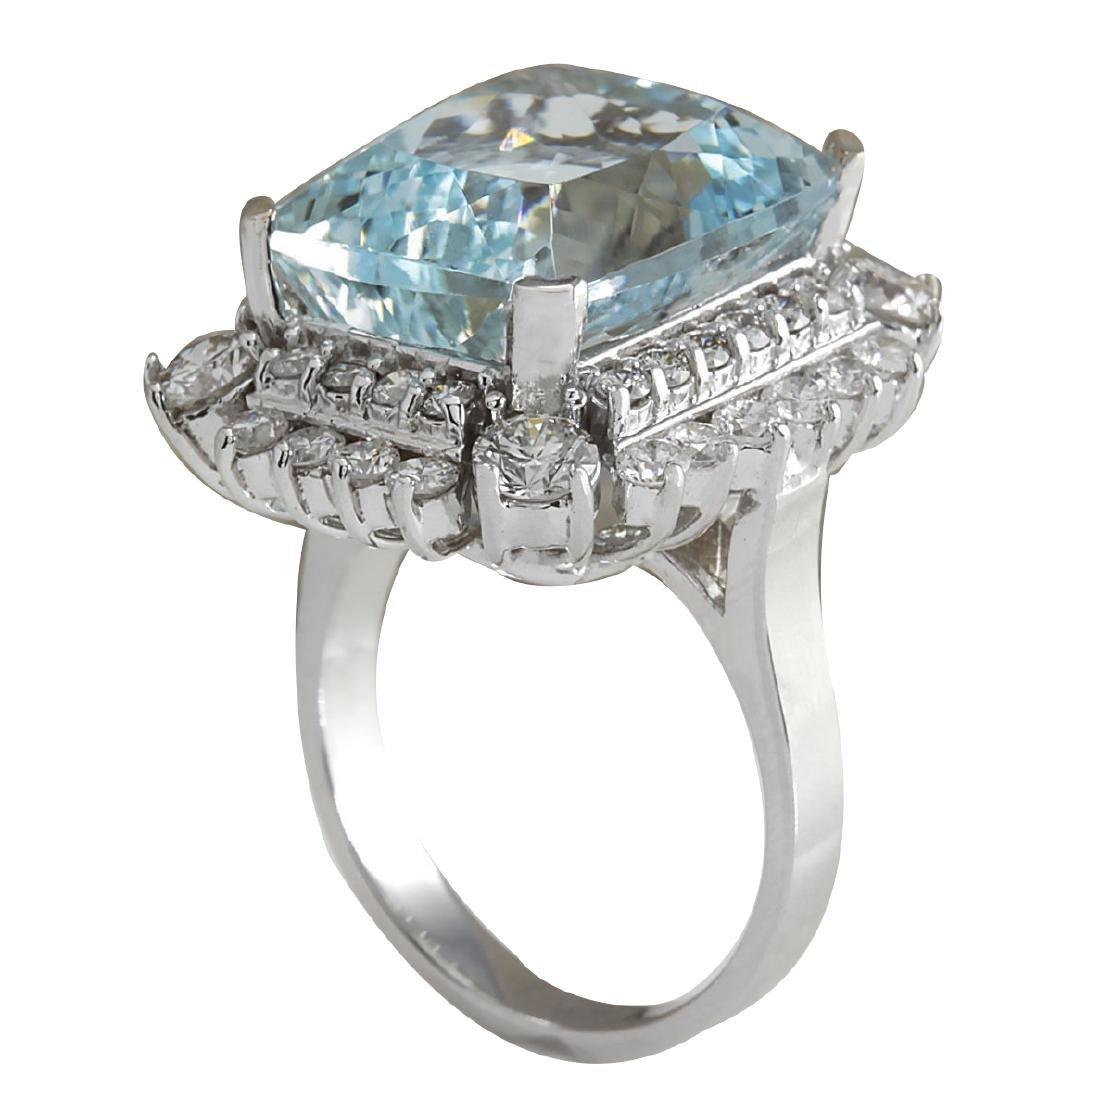 16.54CTW Natural Aquamarine And Diamond Ring In 18K - 3